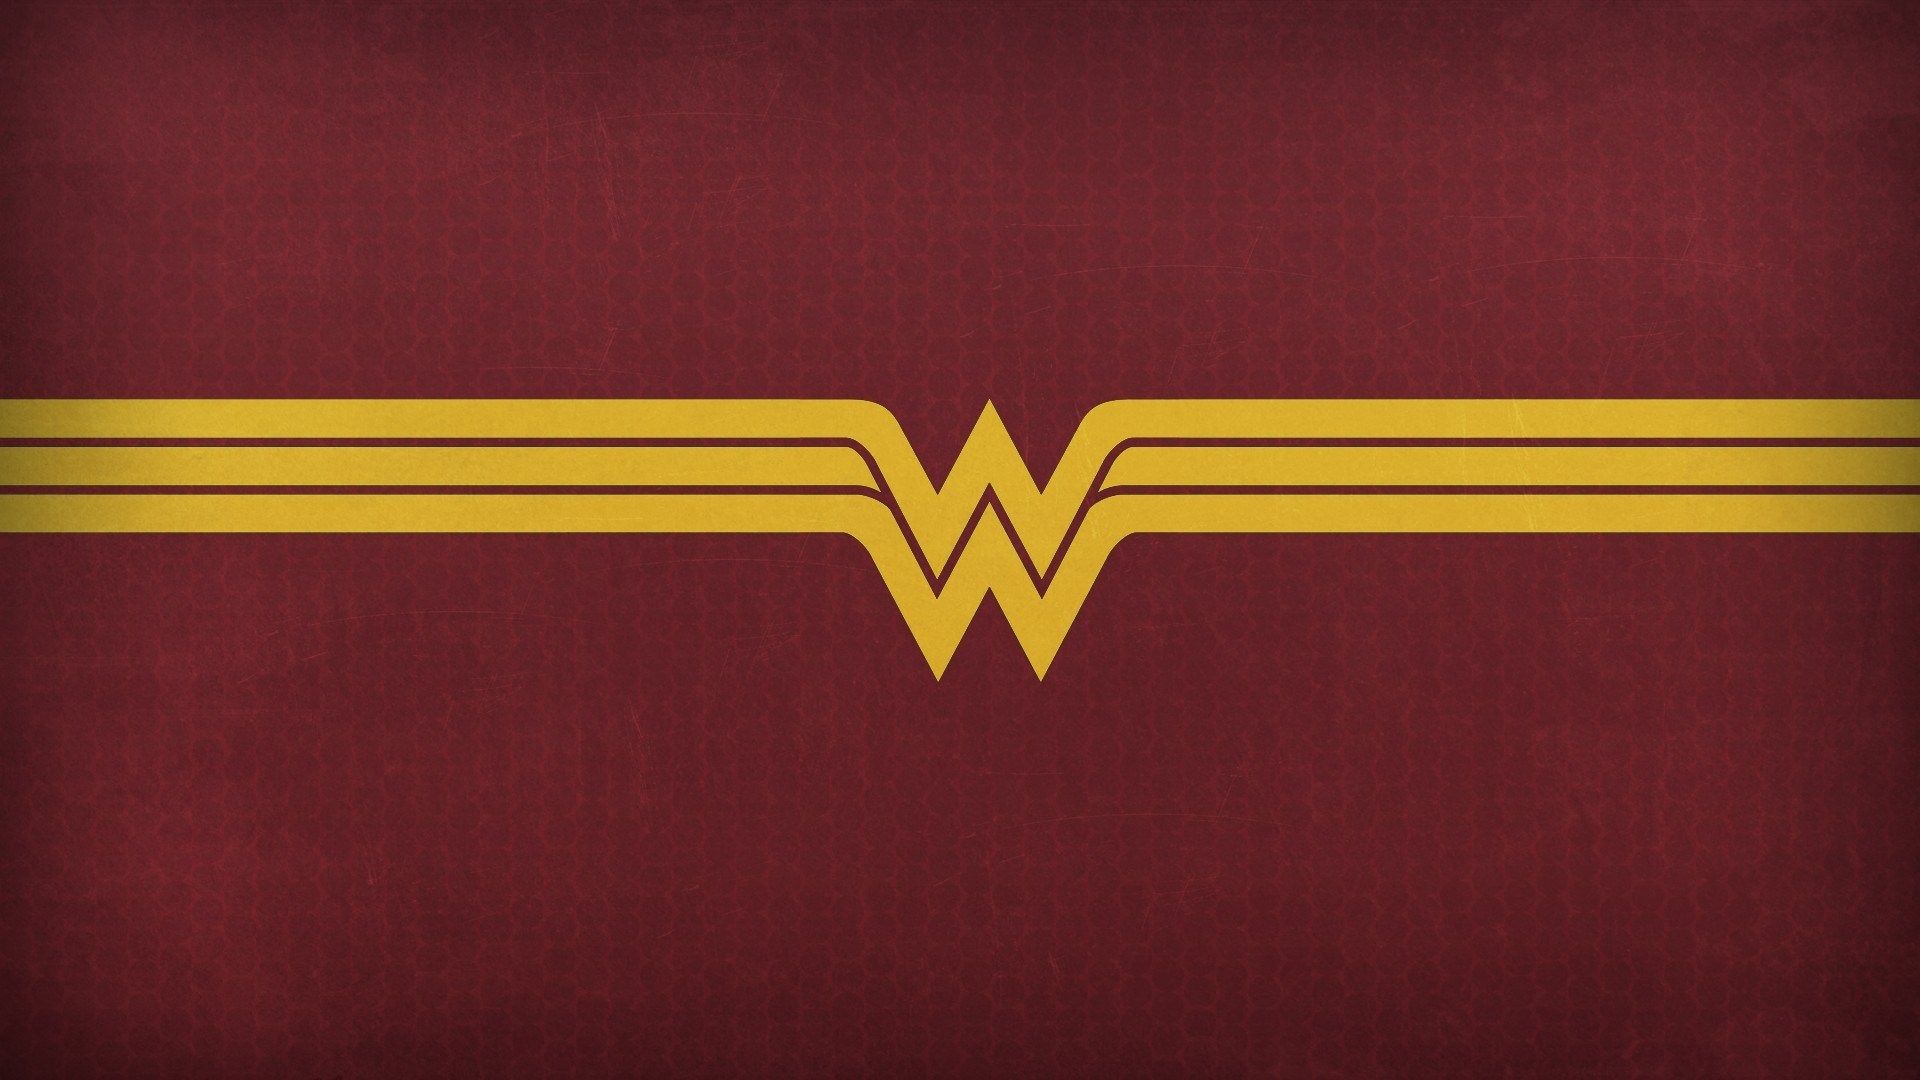 1920x1080 Wonder Woman High Res Wallpaper Wonder Woman Logo Wallpaper Notebook Wonder Woman